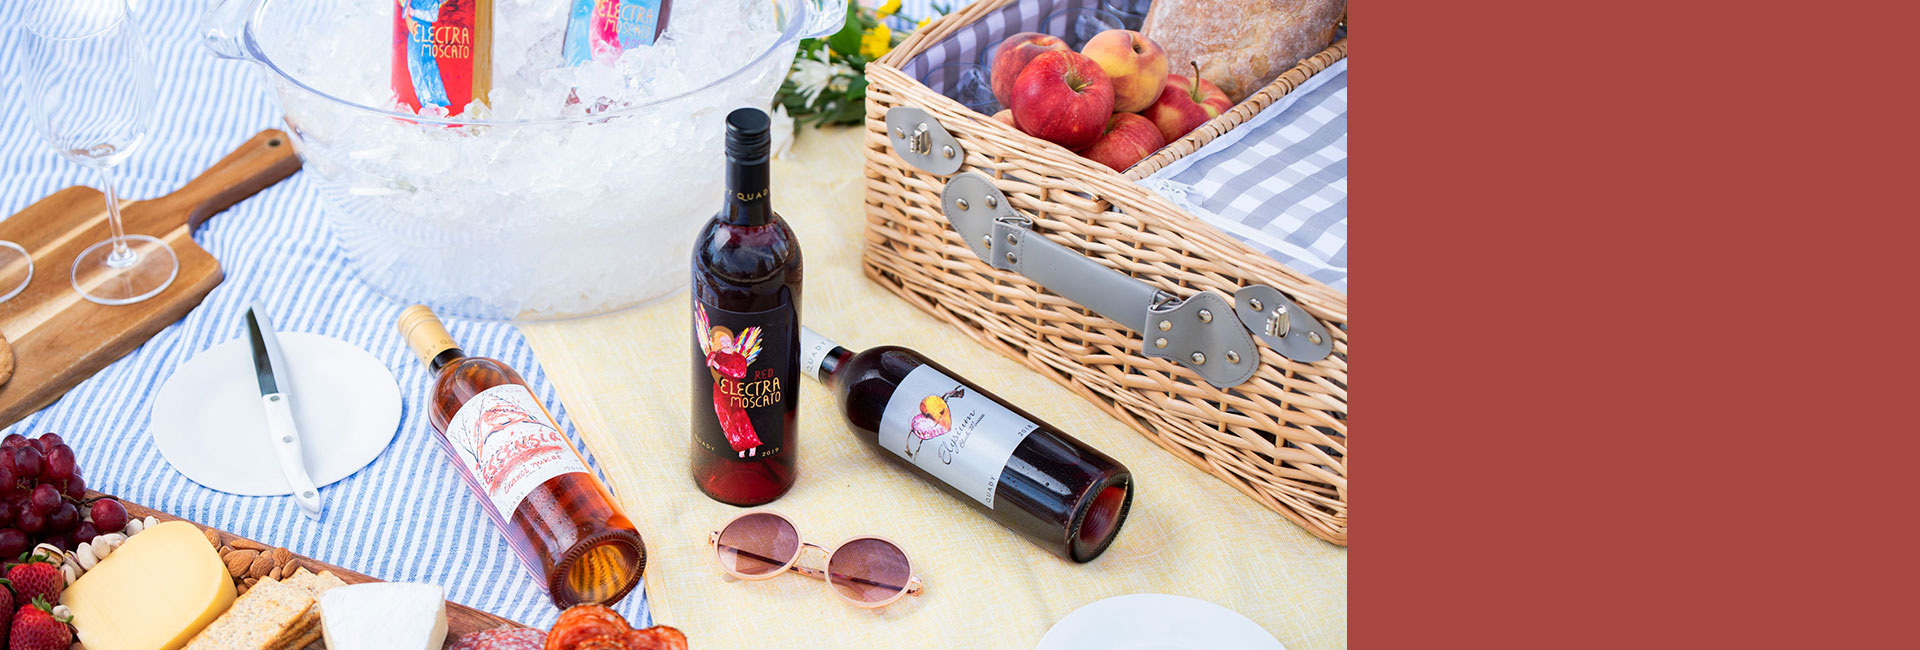 Picnic setting with bottles of Red Electra Moscato, Essensia Orange Muscat dessert wine and Elysium Black Muscat dessert wine.